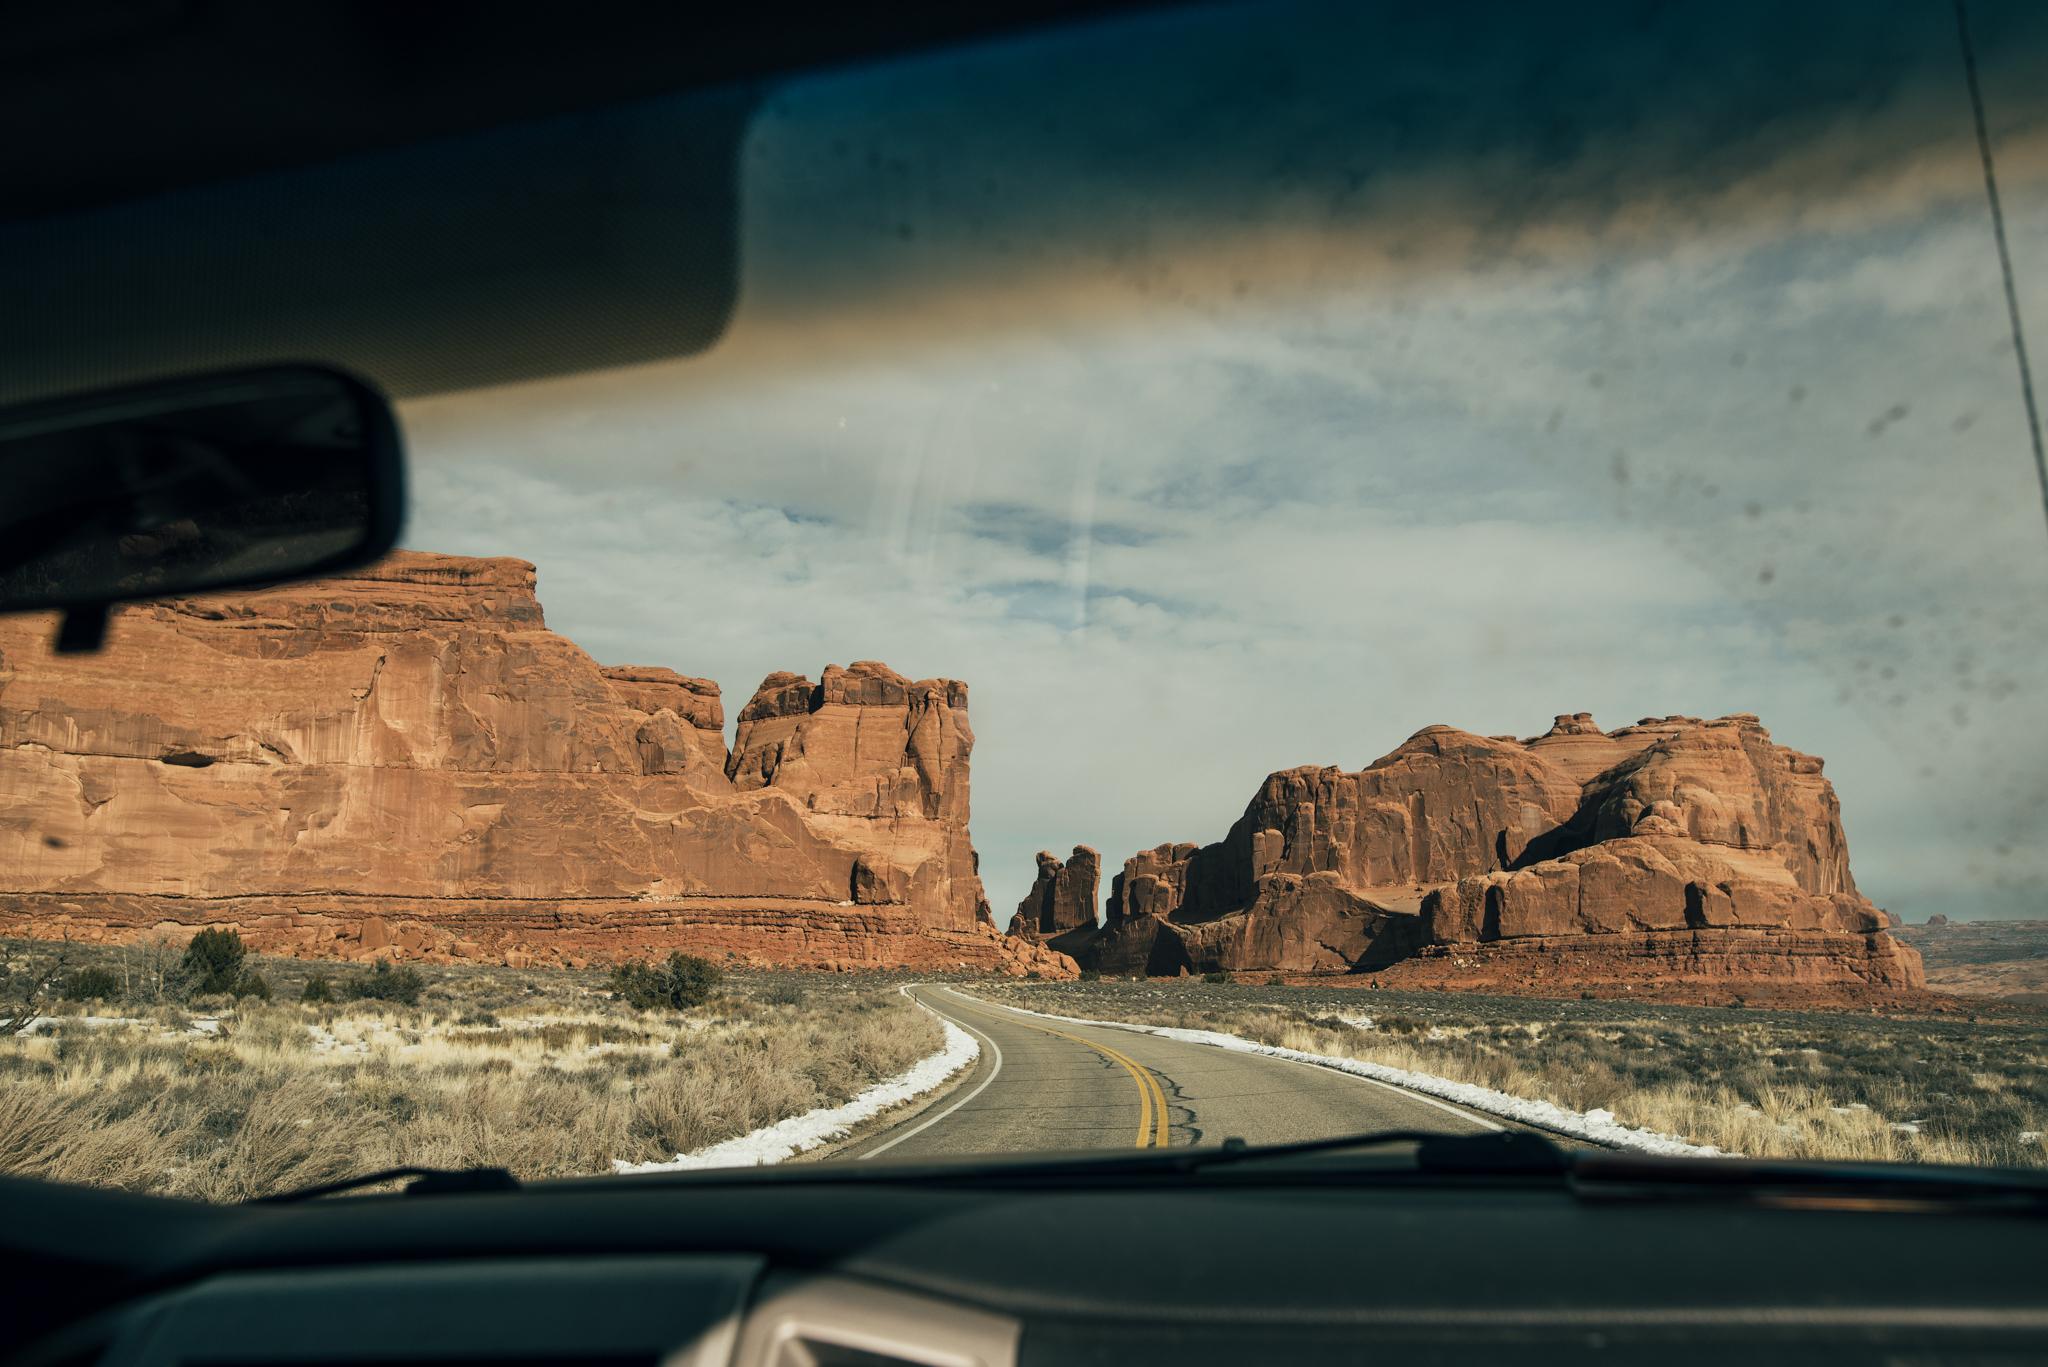 Isaiah-&-Taylor-Photography---White-Sand-Dunes-1.jpg